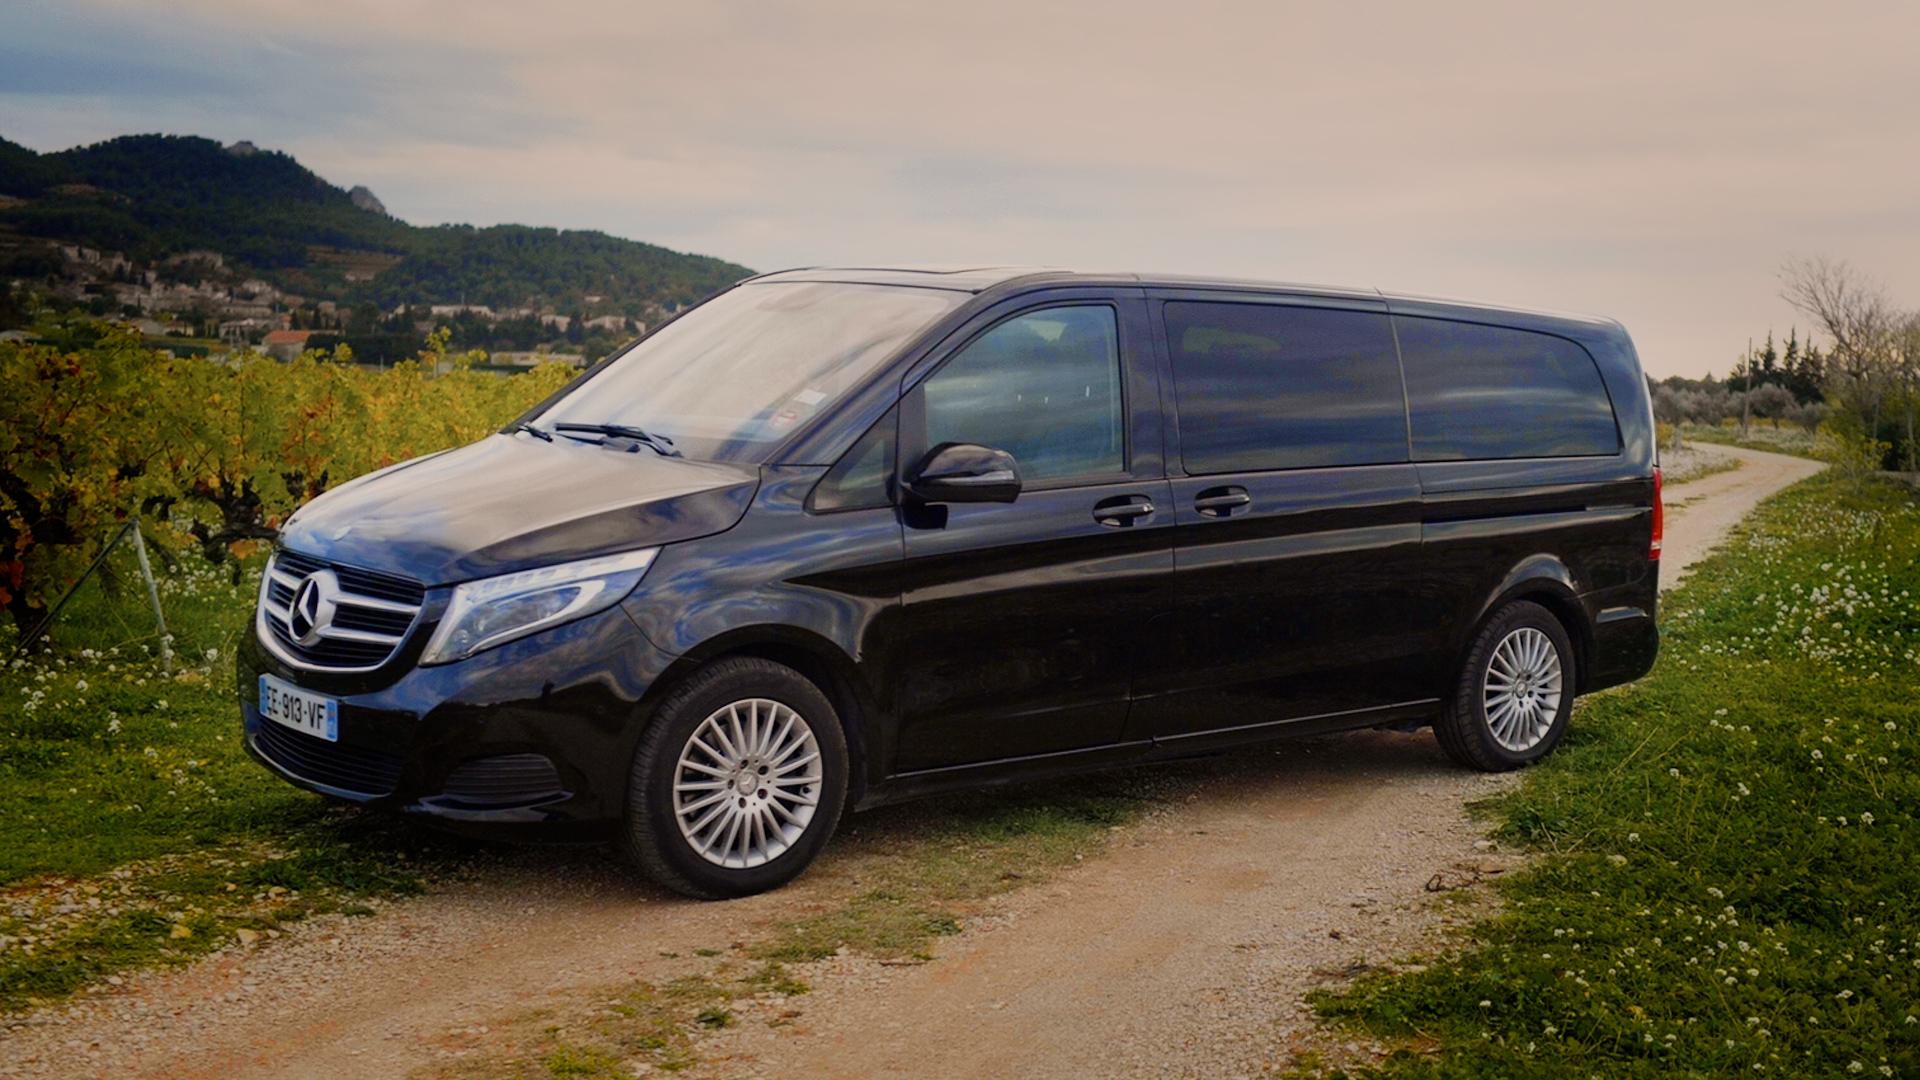 AM Transfert - Chauffeur Privé en Provence